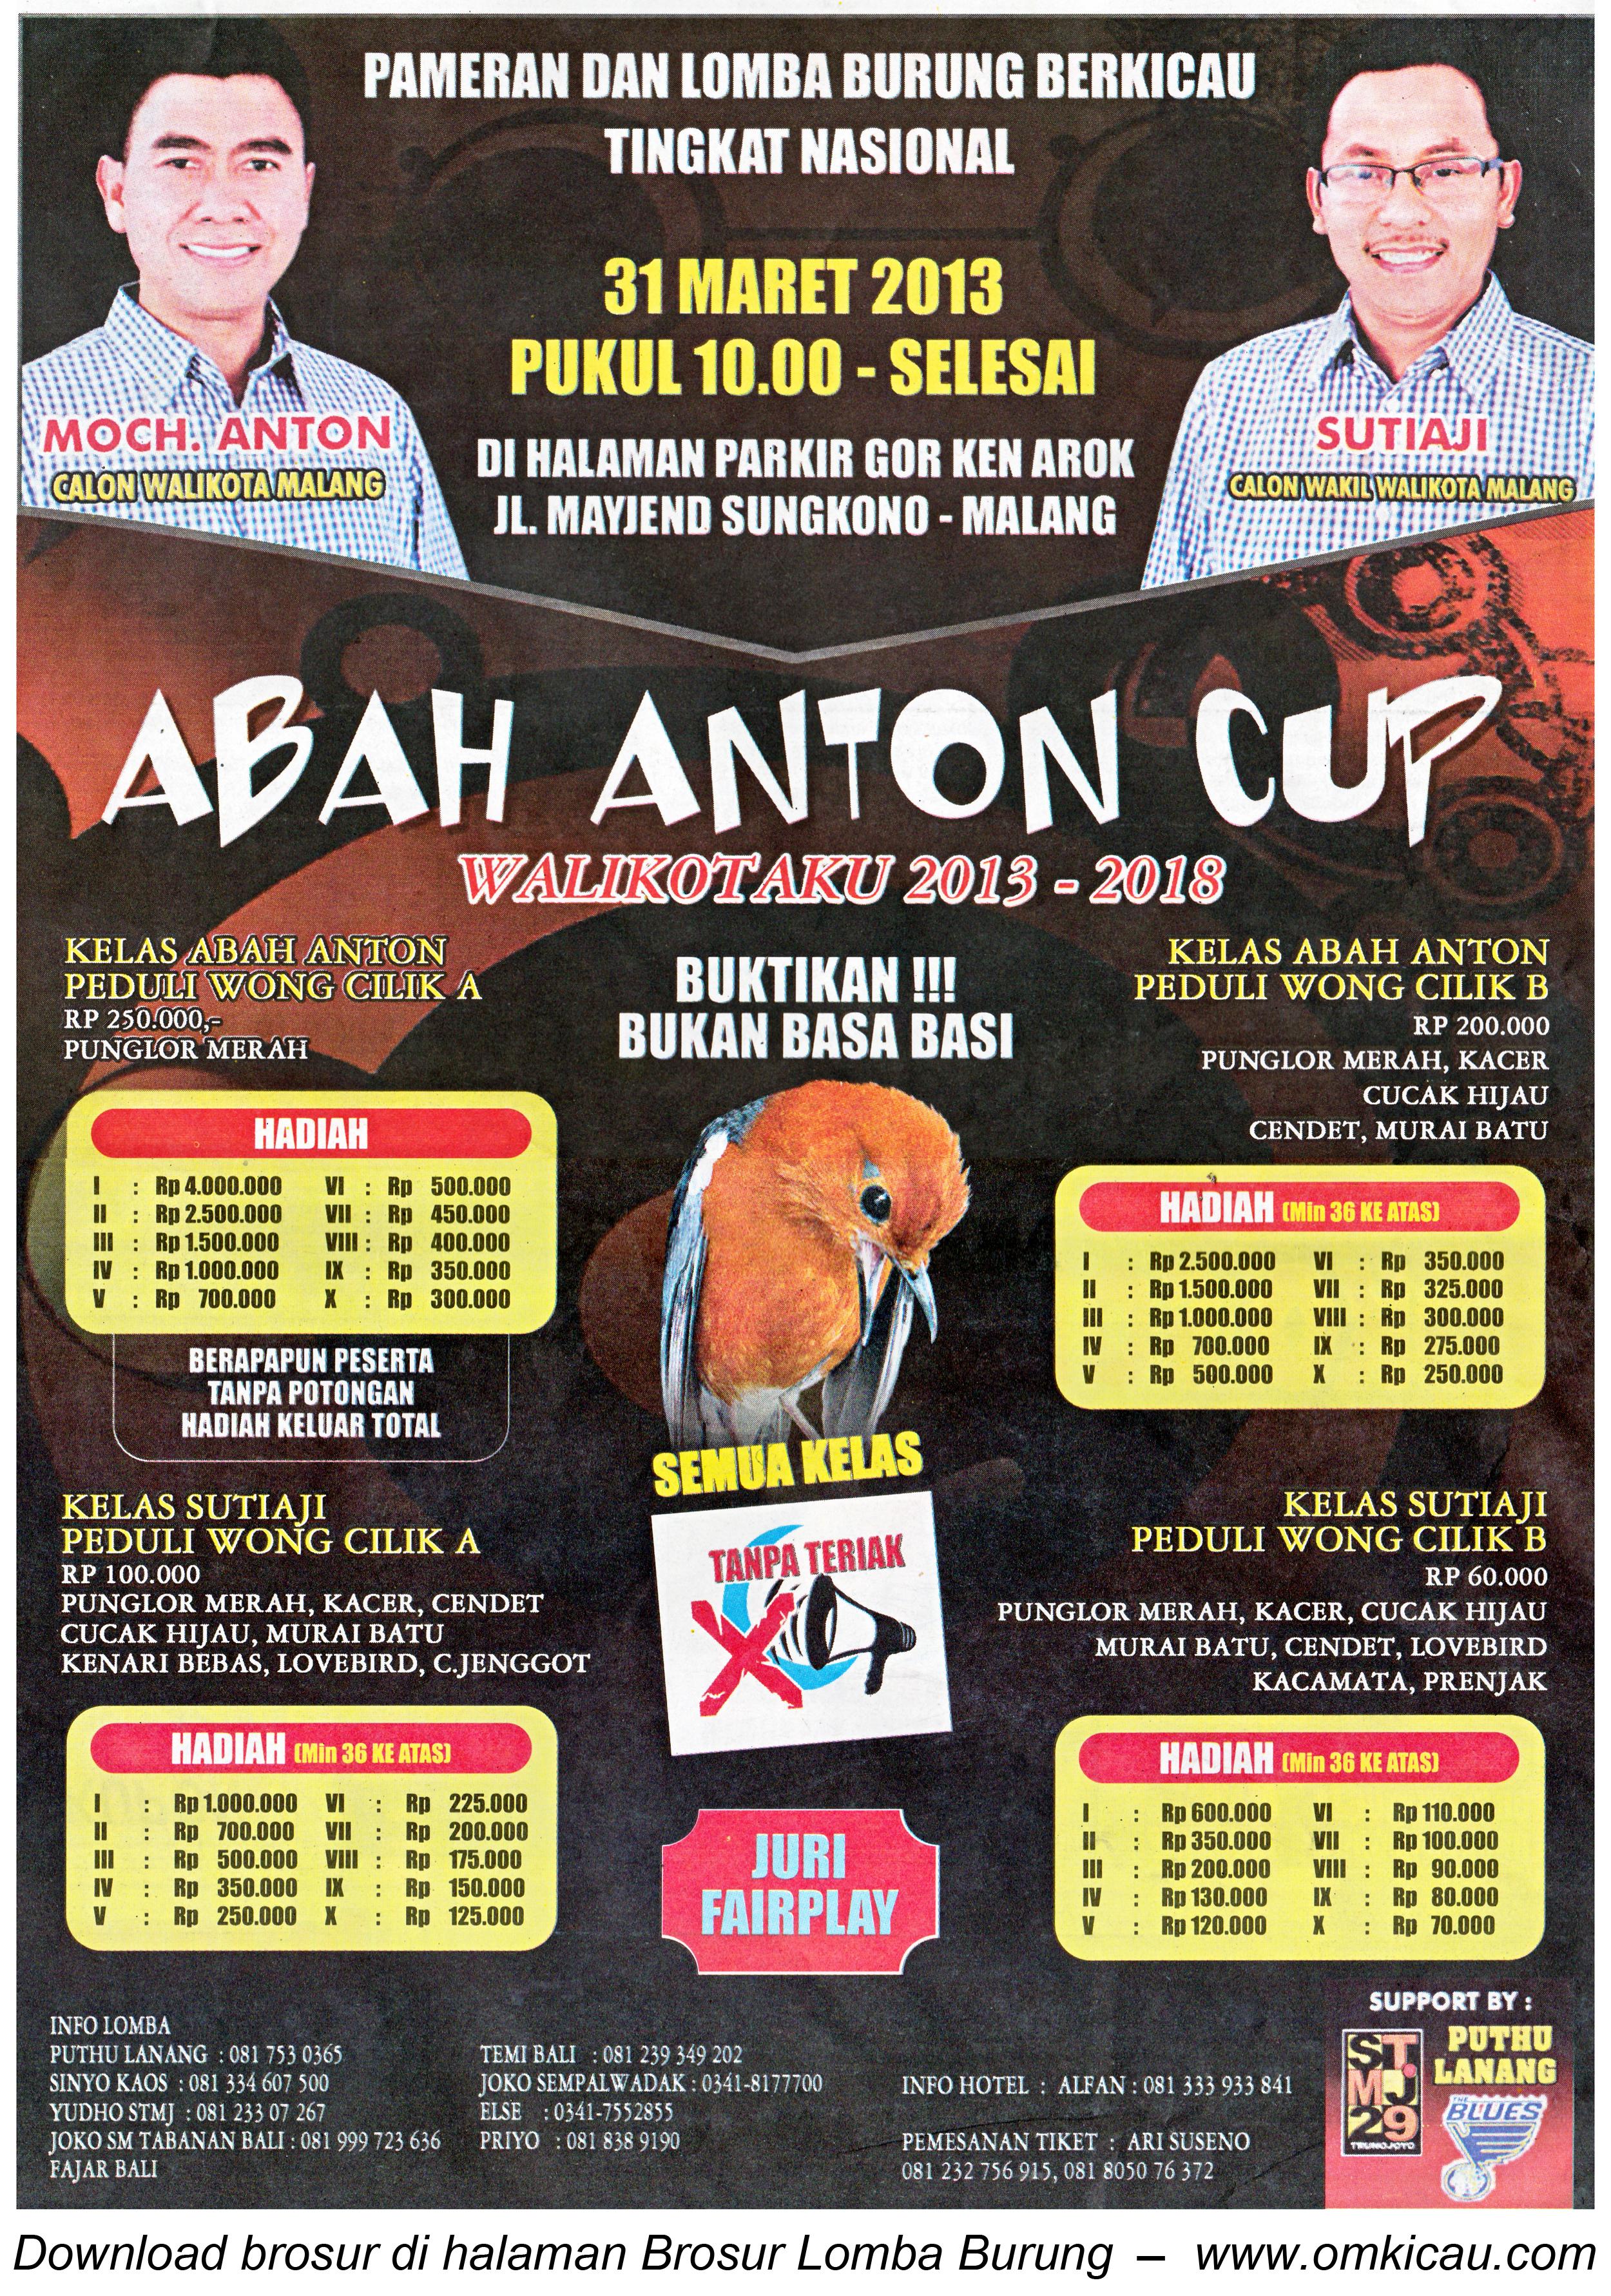 Brosur Lomba Burung Abah Anton Cup